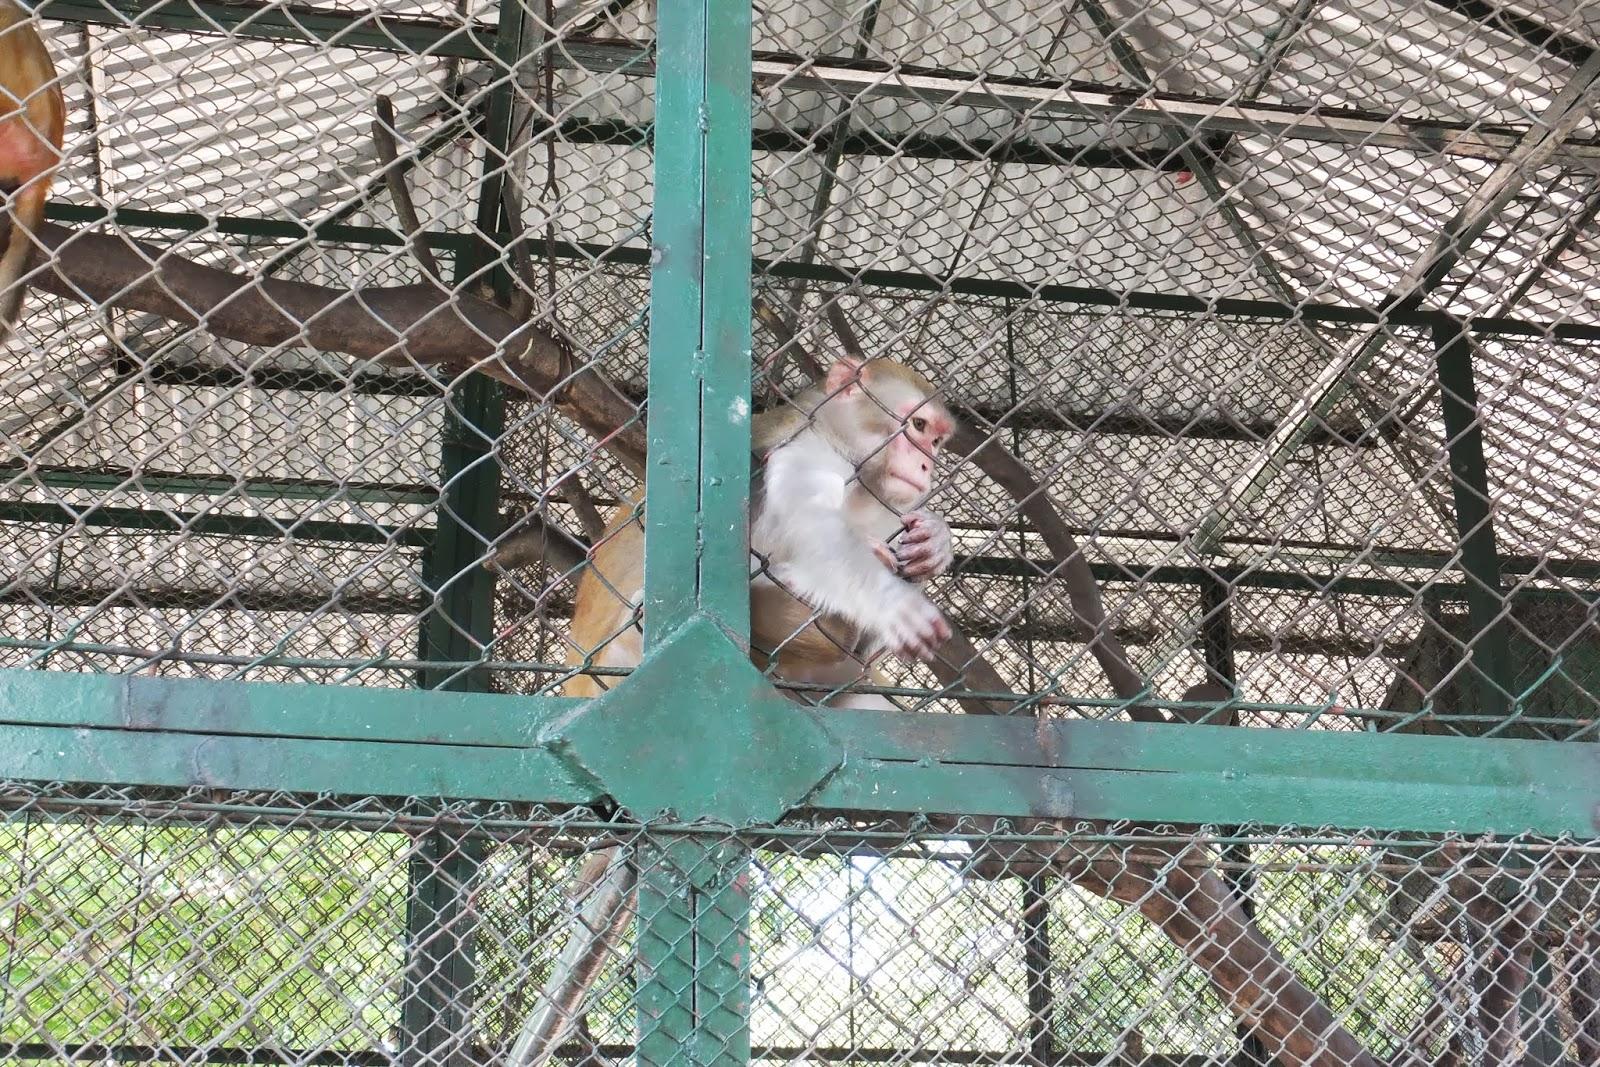 hanoi-zoo-monkey ハノイ動物園の猿3